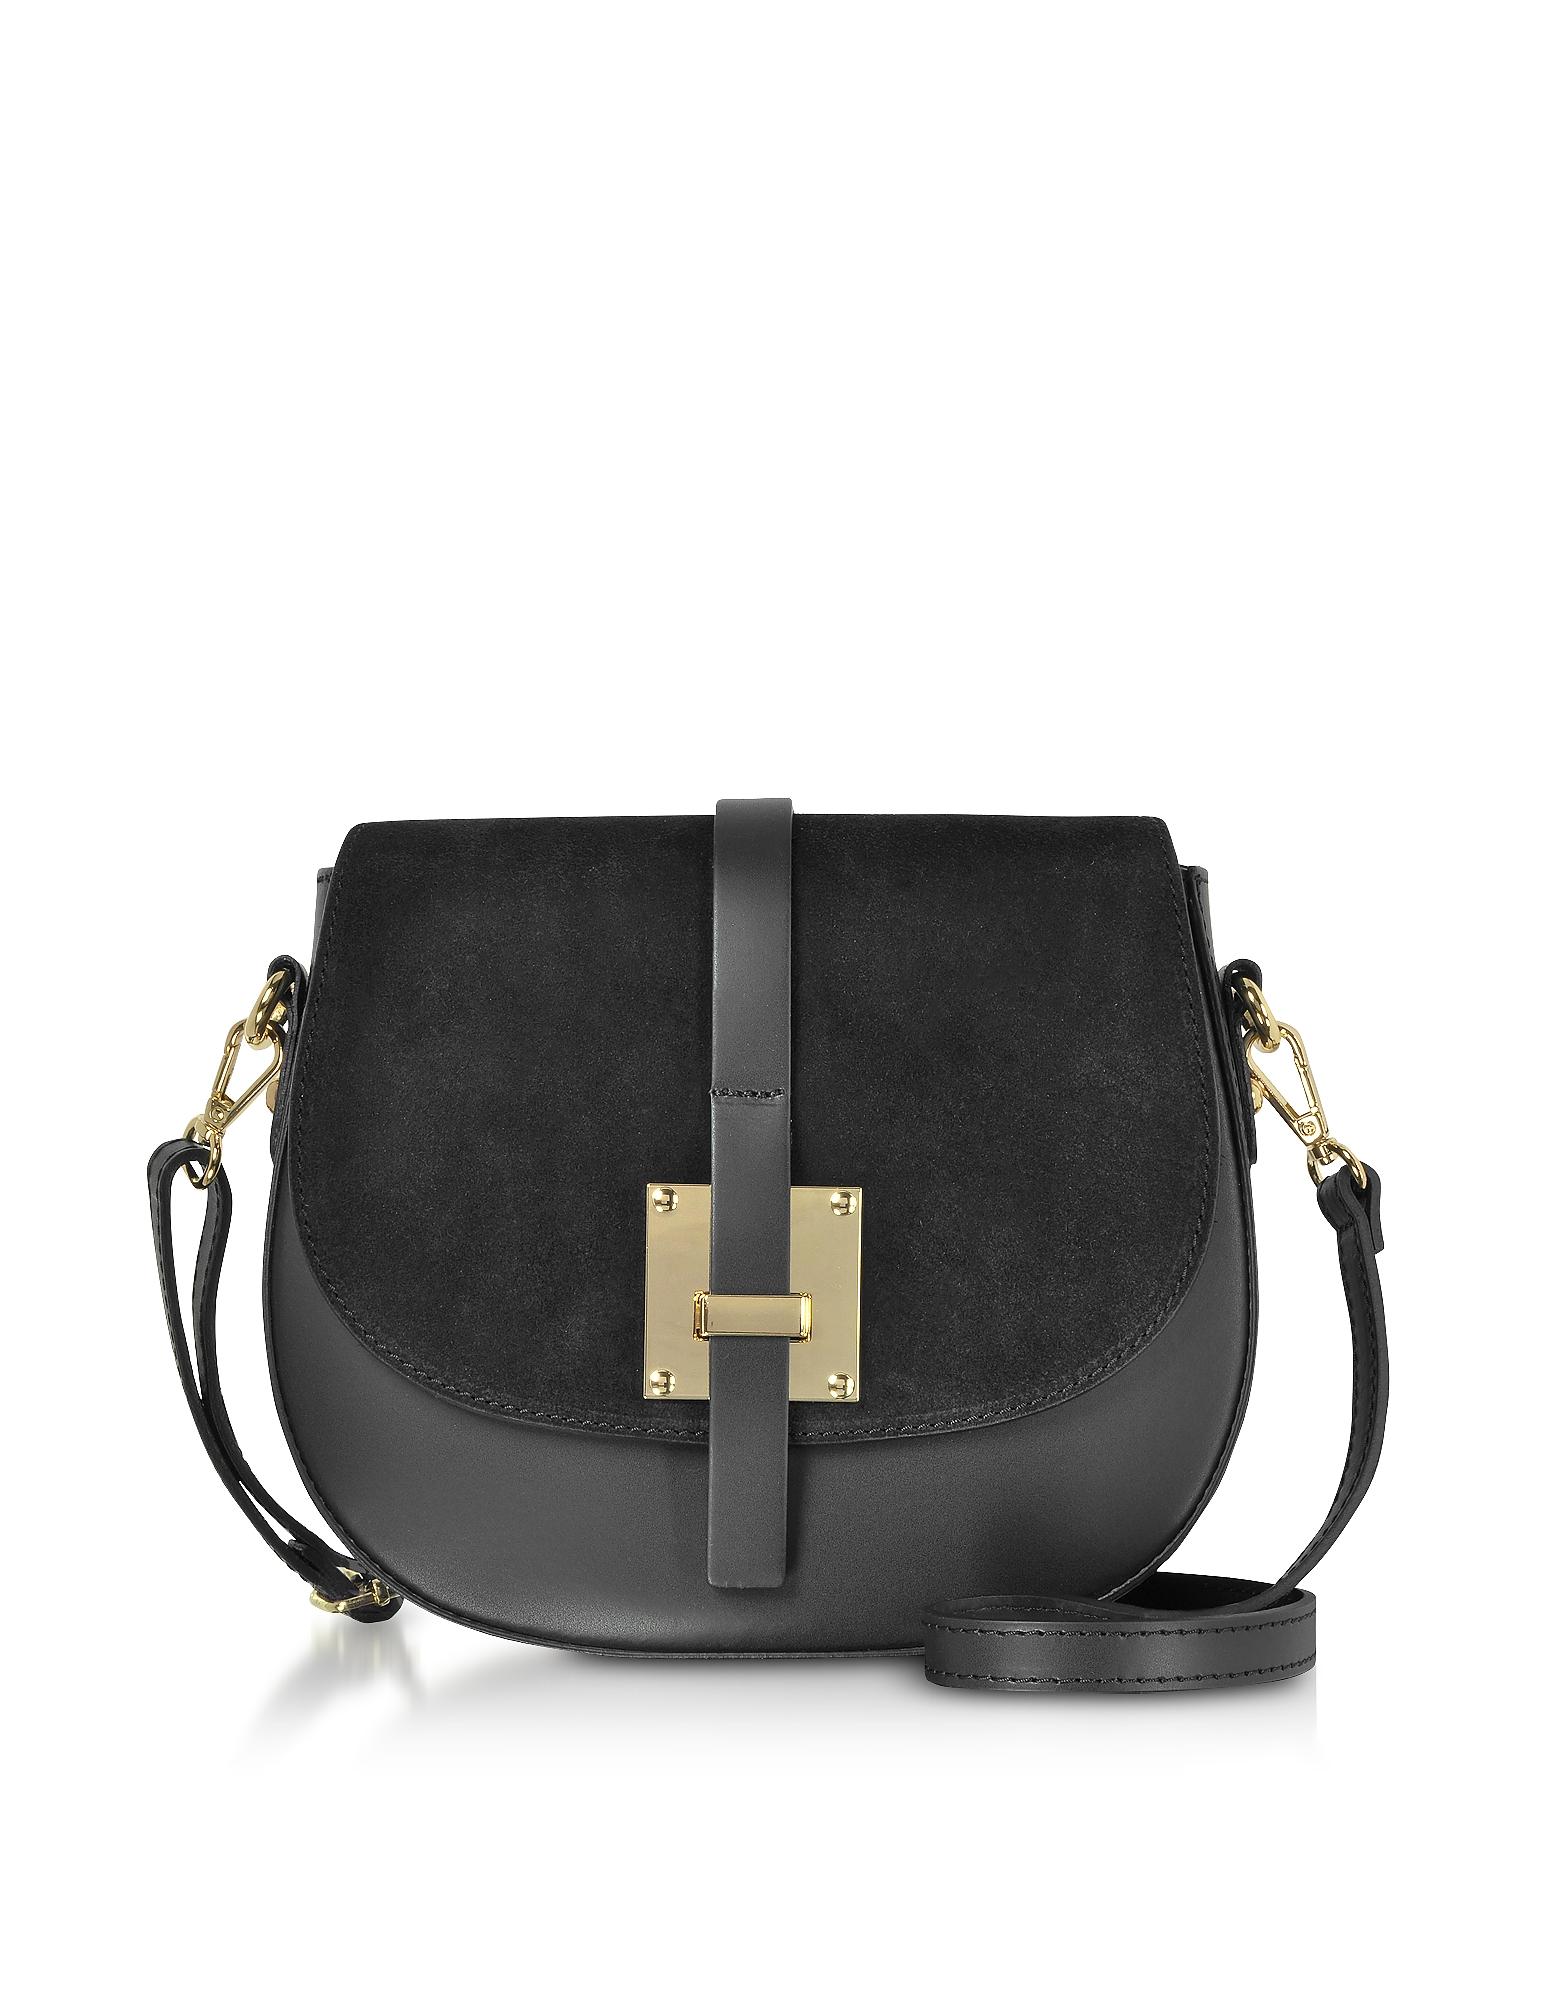 Le Parmentier Handbags, Pollia Black Leather and Suede Crossbody Bag